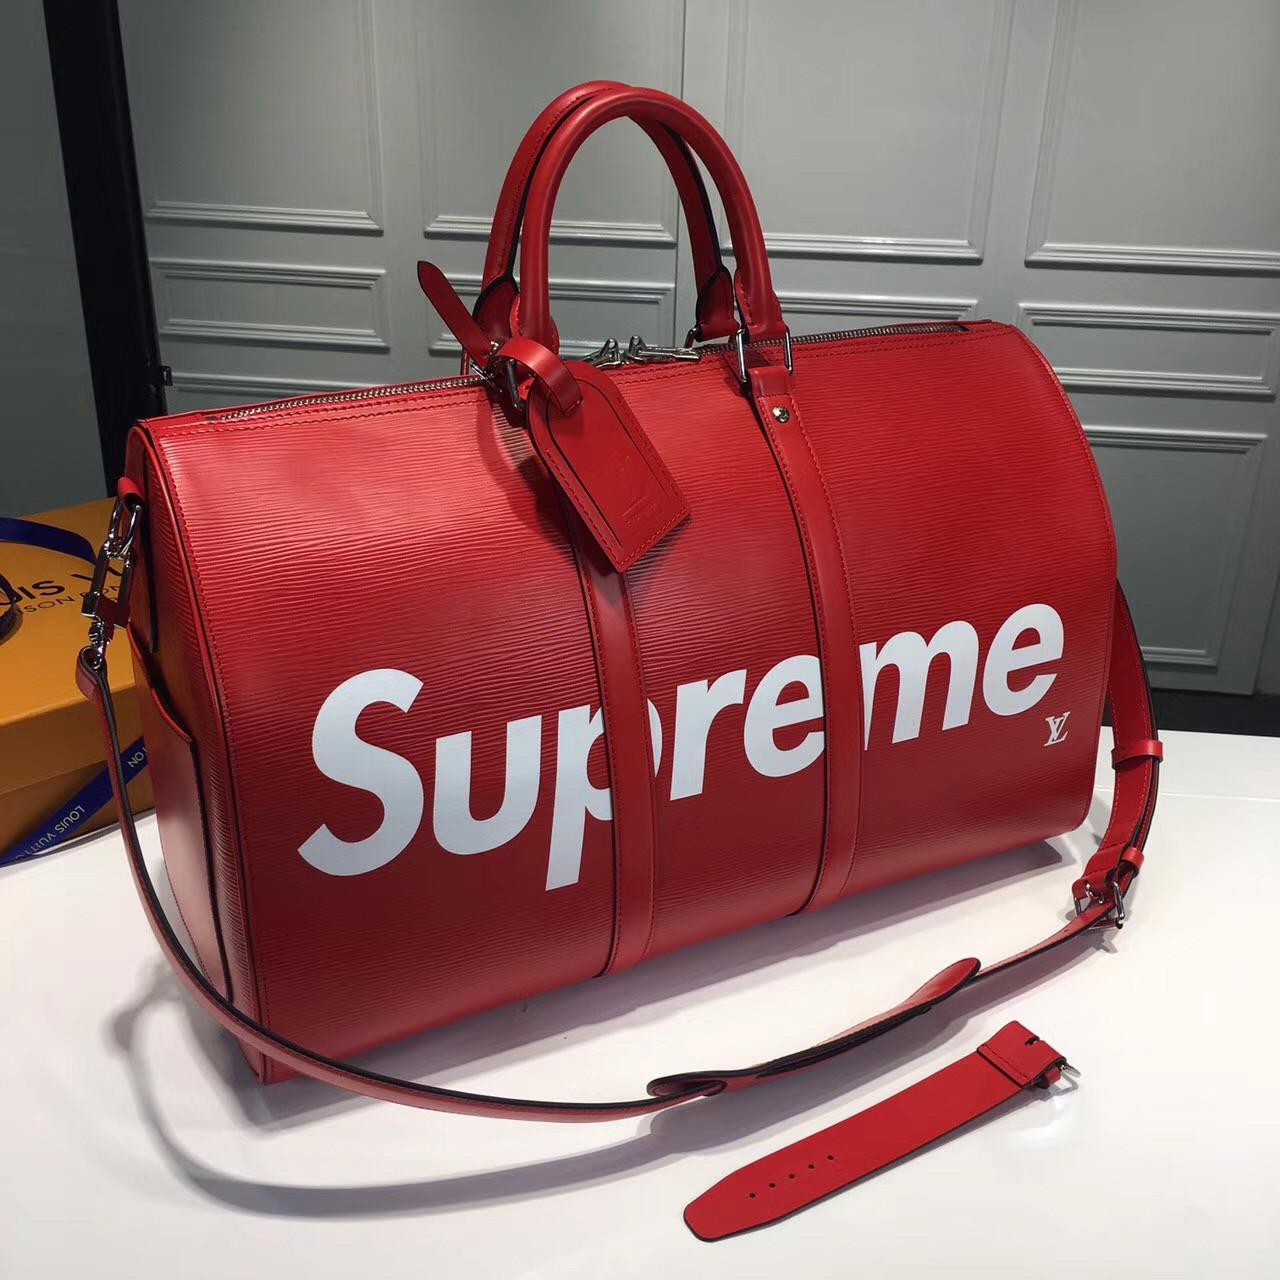 692183f51f98 Supreme Louis Vuitton сумка, цена 14 990 грн., купить в Киеве — Prom ...